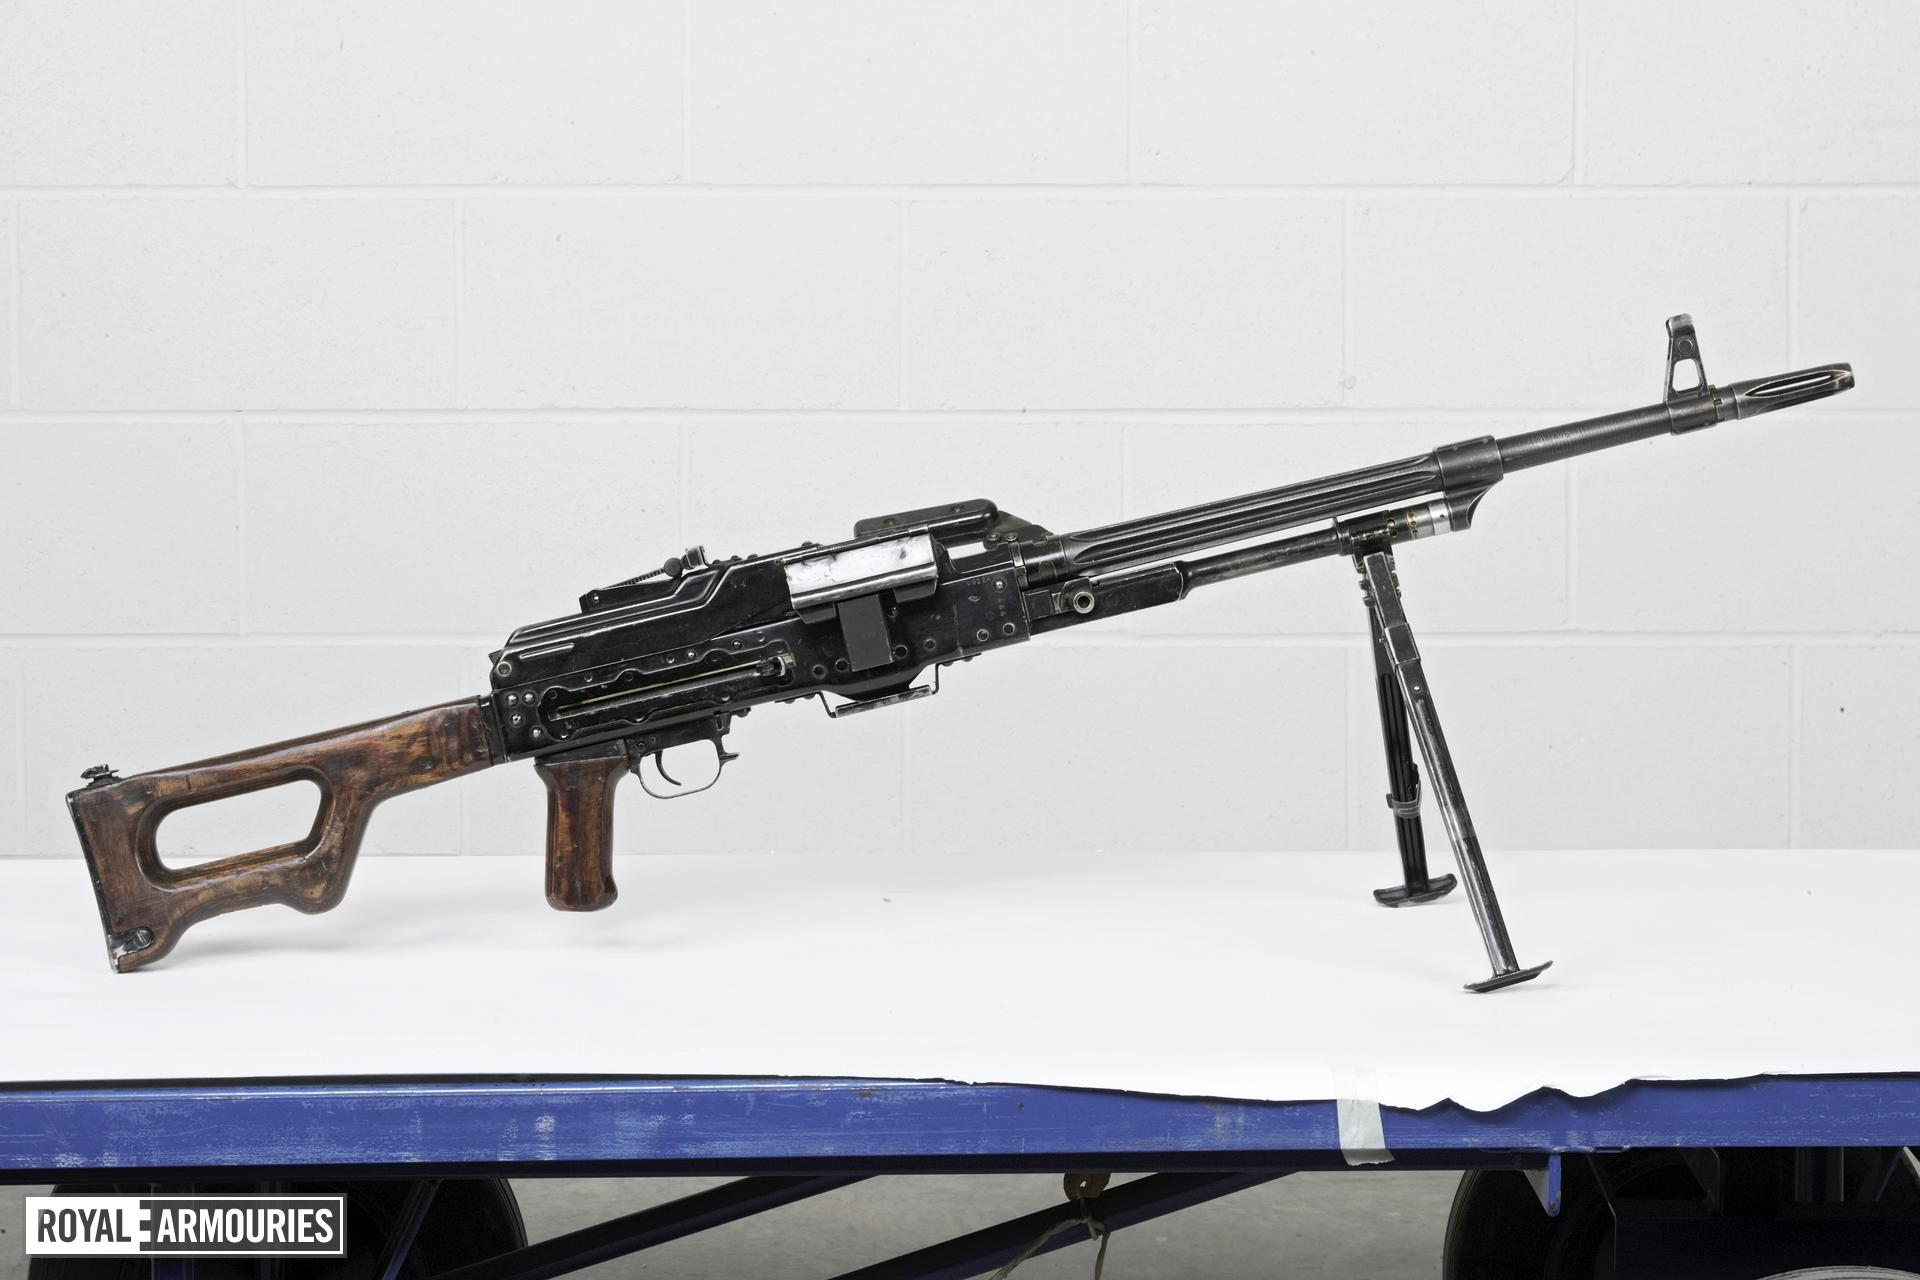 Centrefire automatic machine gun - Kalashnikov PK